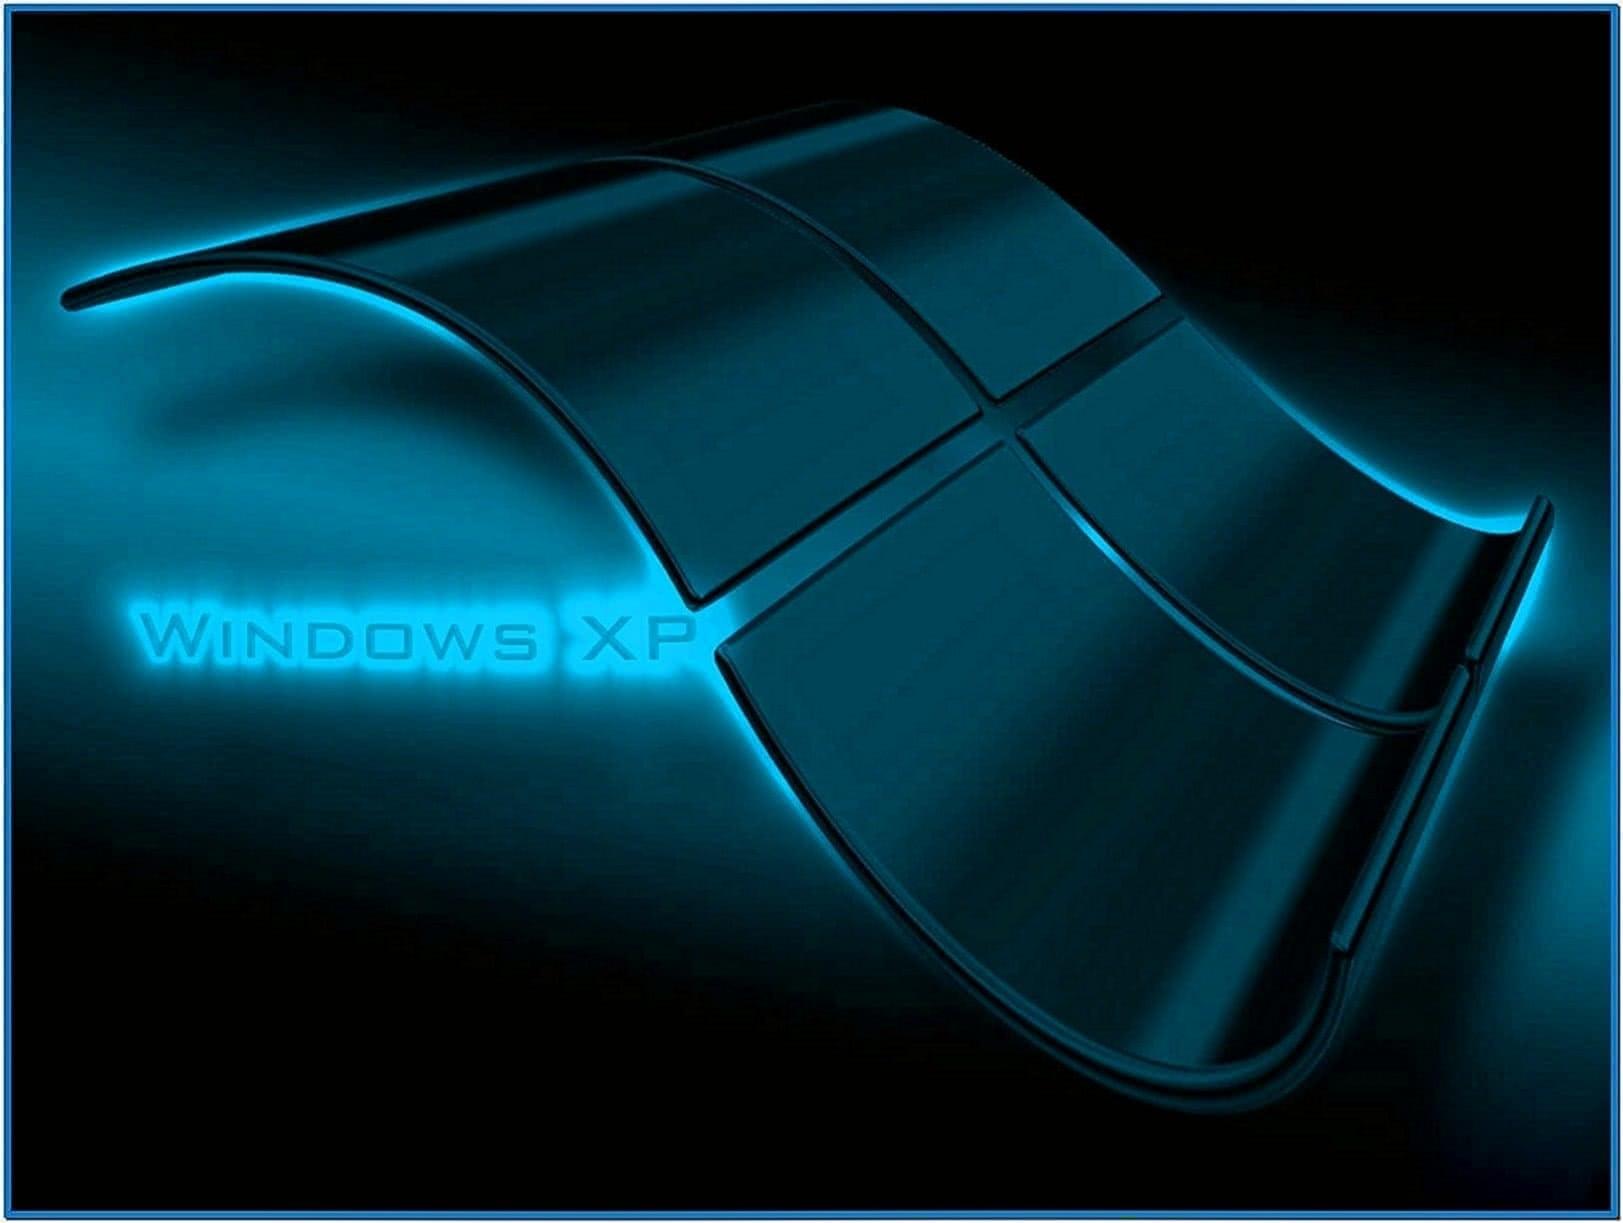 Wallpaper and Screensavers Windows XP Desktop